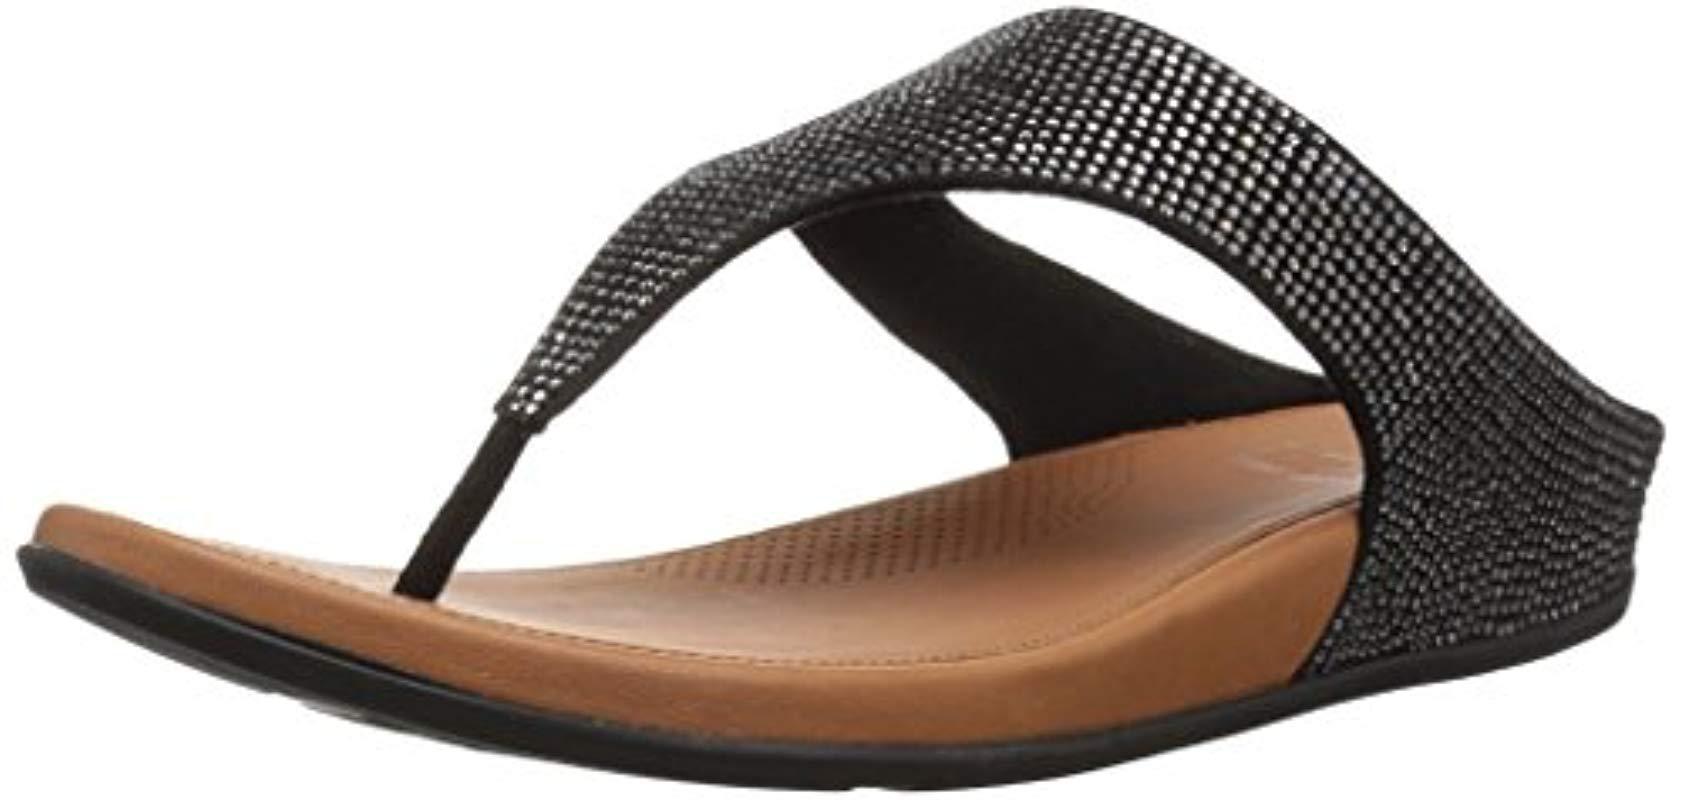 978bd80be Lyst - Fitflop Banda Glitz Sandal in Black